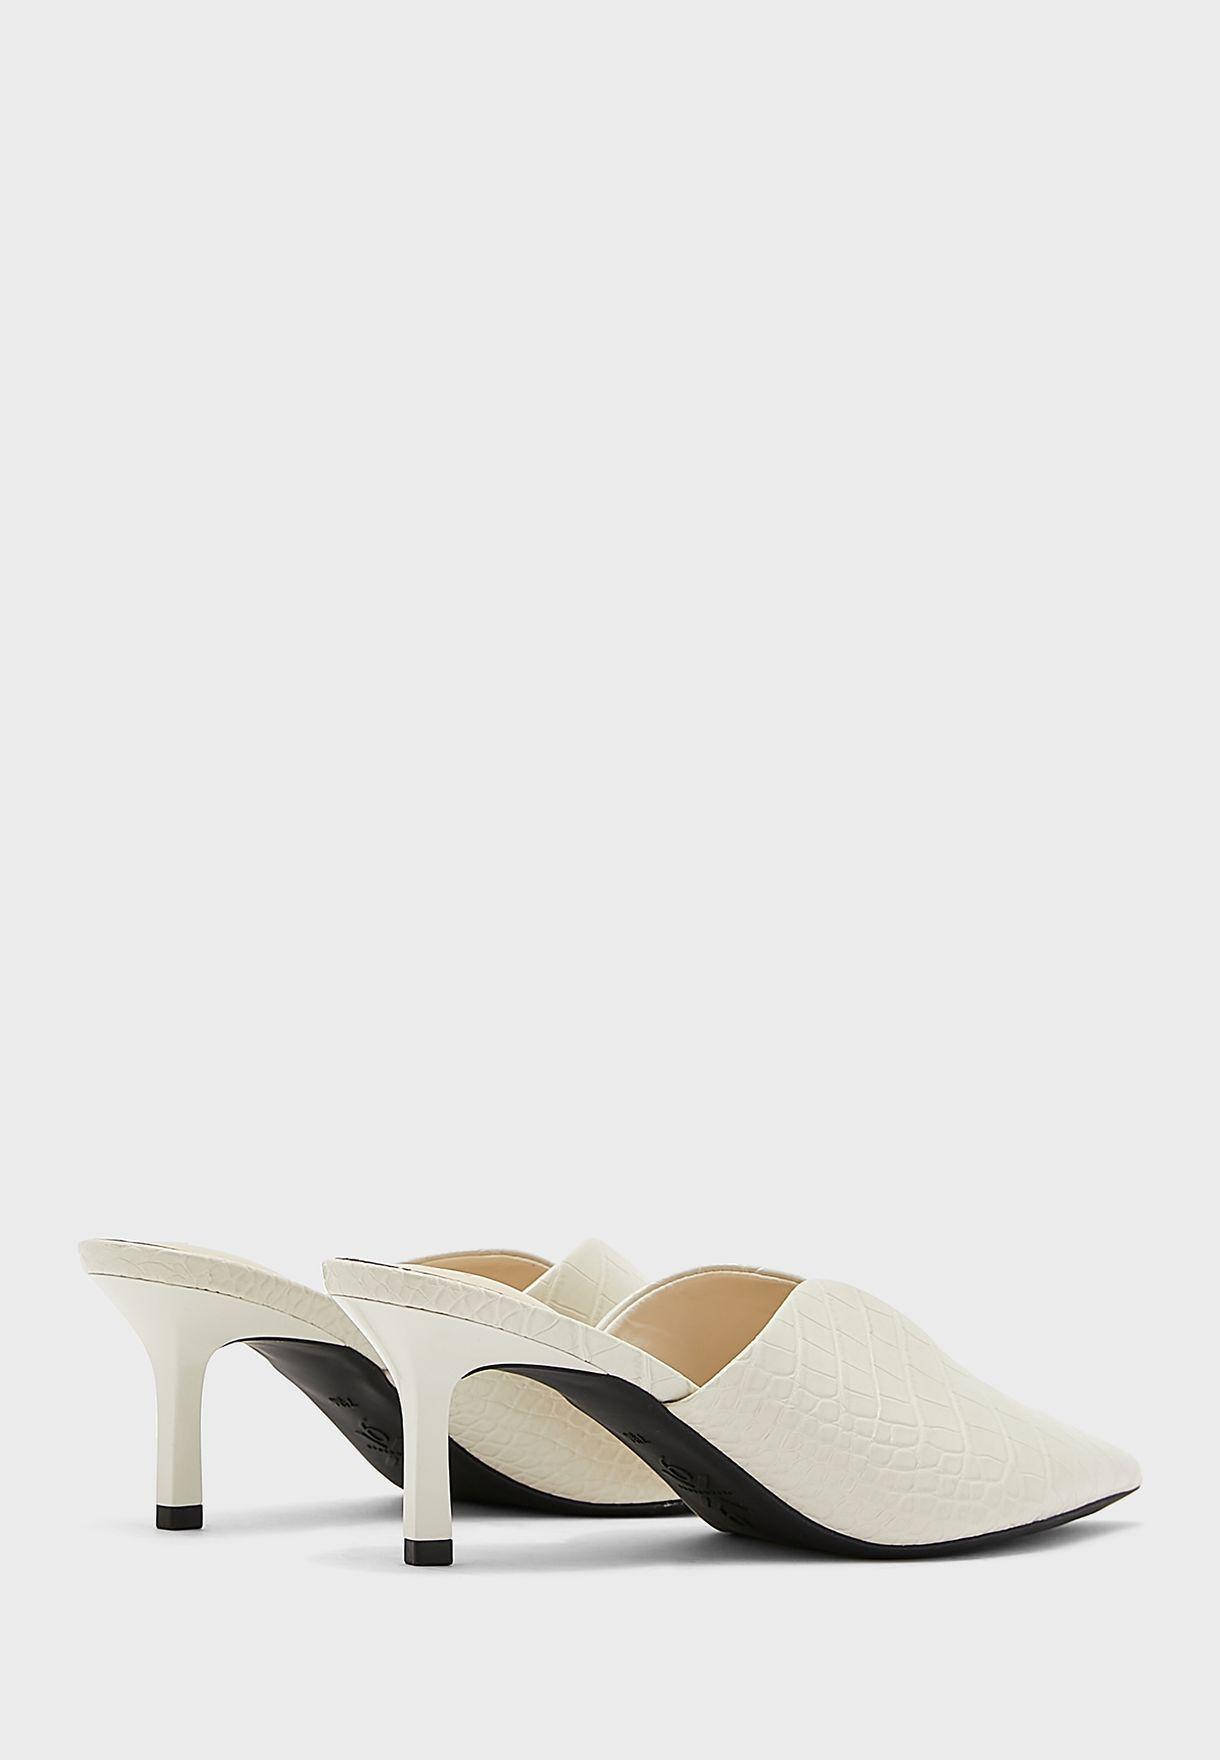 Kapps9X93 Pointed Textured Mid-Heel Sandals